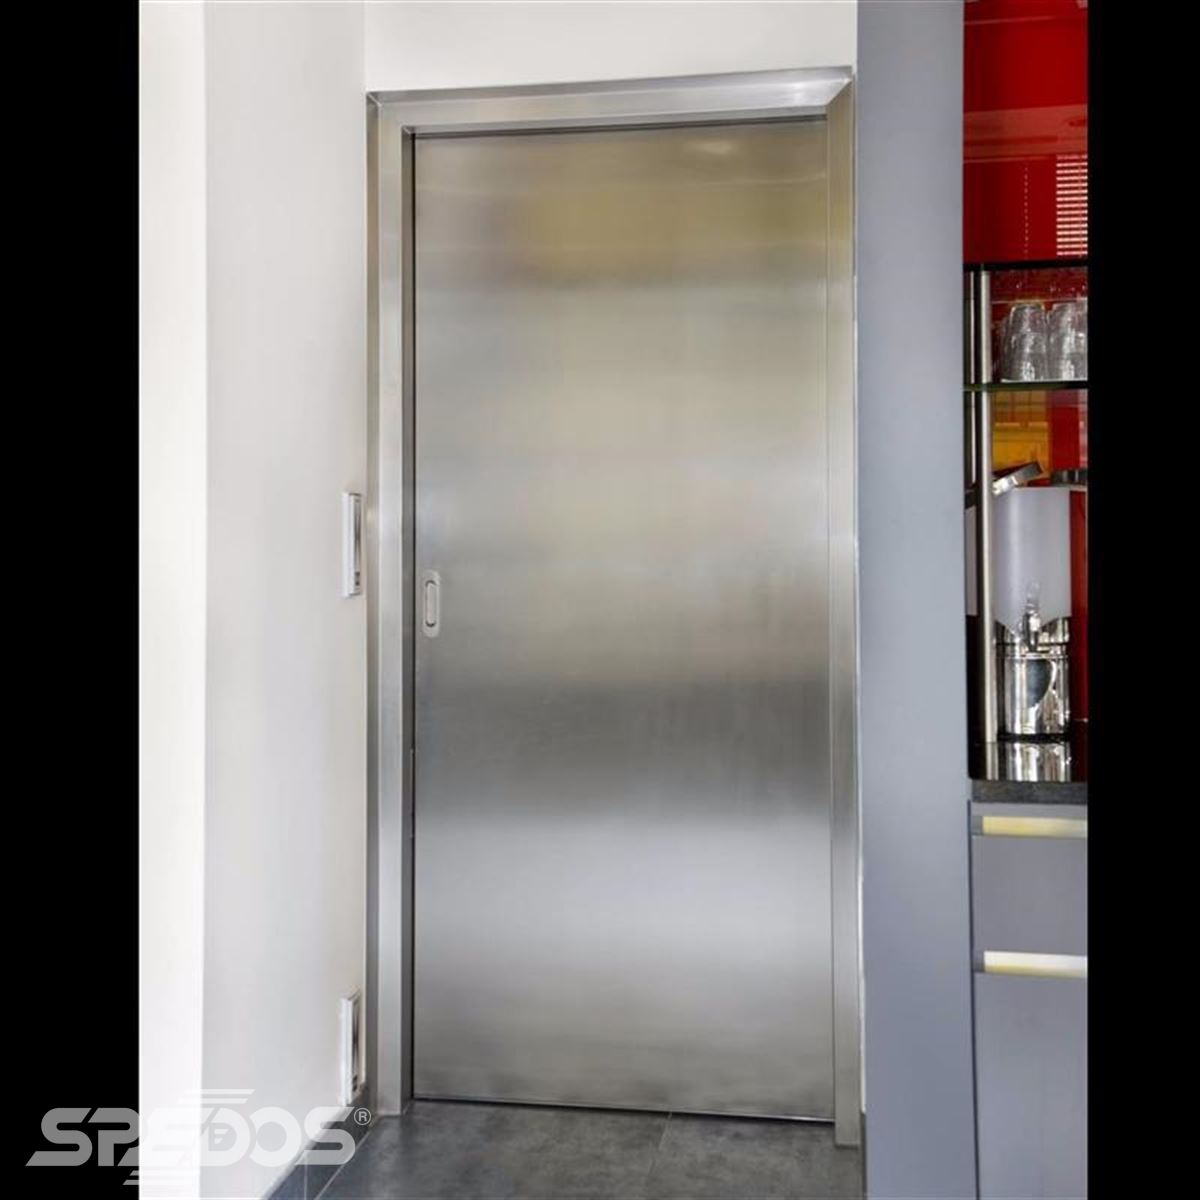 jednokřídlé automatické dvere posuvné v nerezu